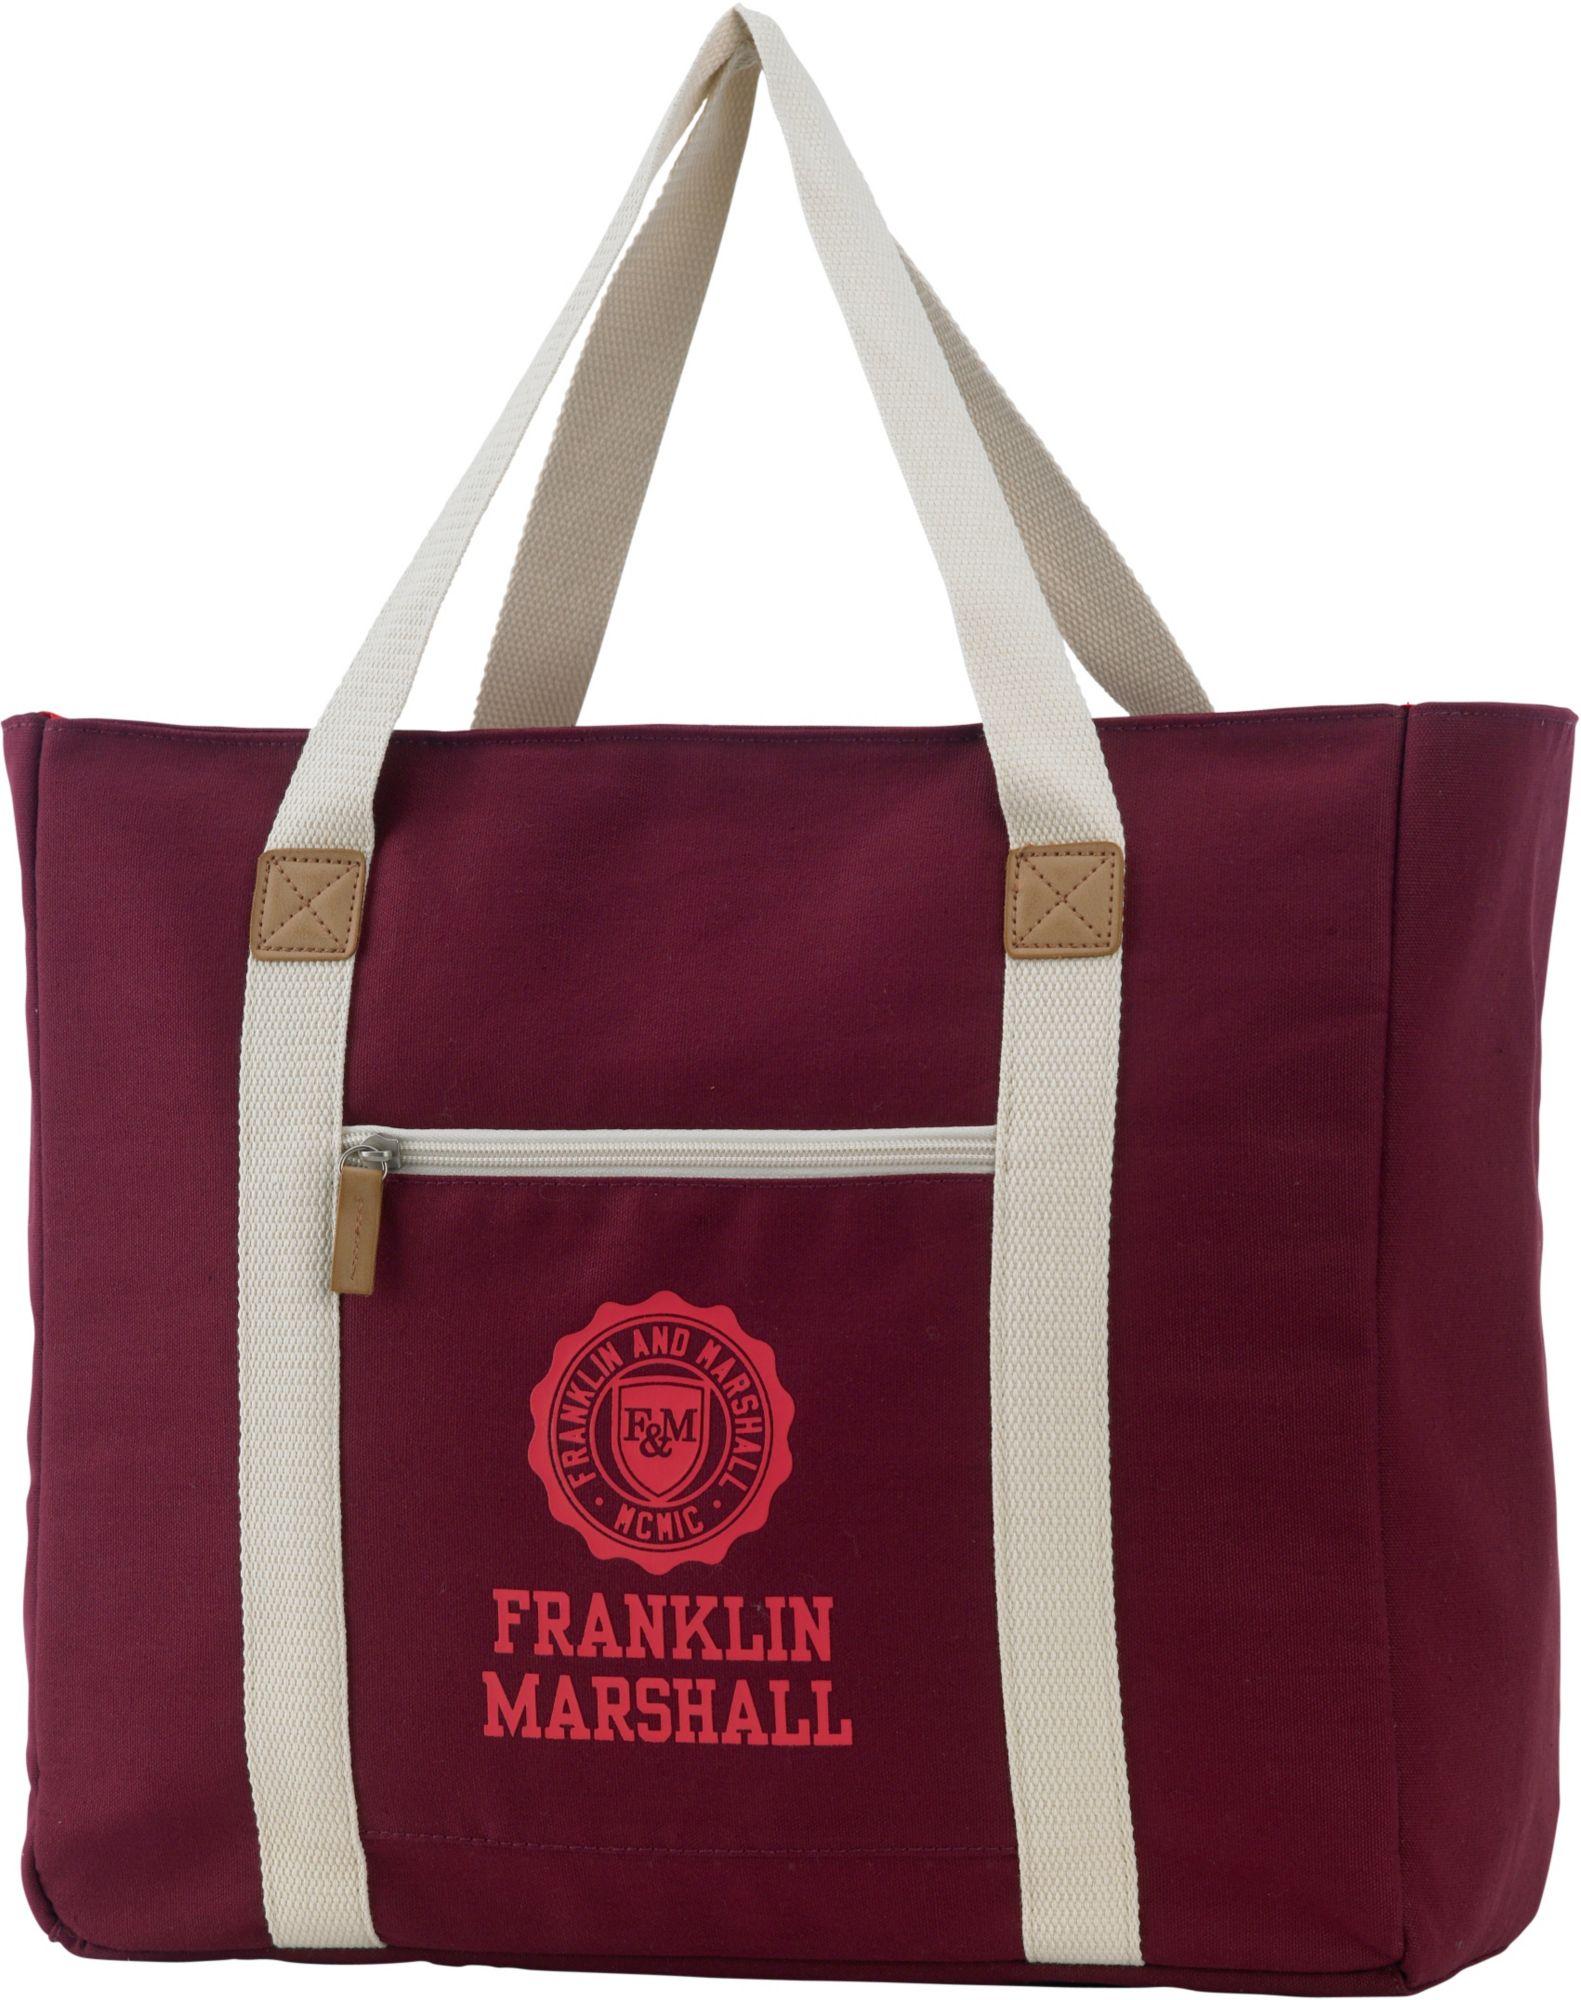 FRANKLIN MARSHALL Franklin & Marshall, Schultertasche mit Extrafach, »Girls Shopper, bordeaux rot«